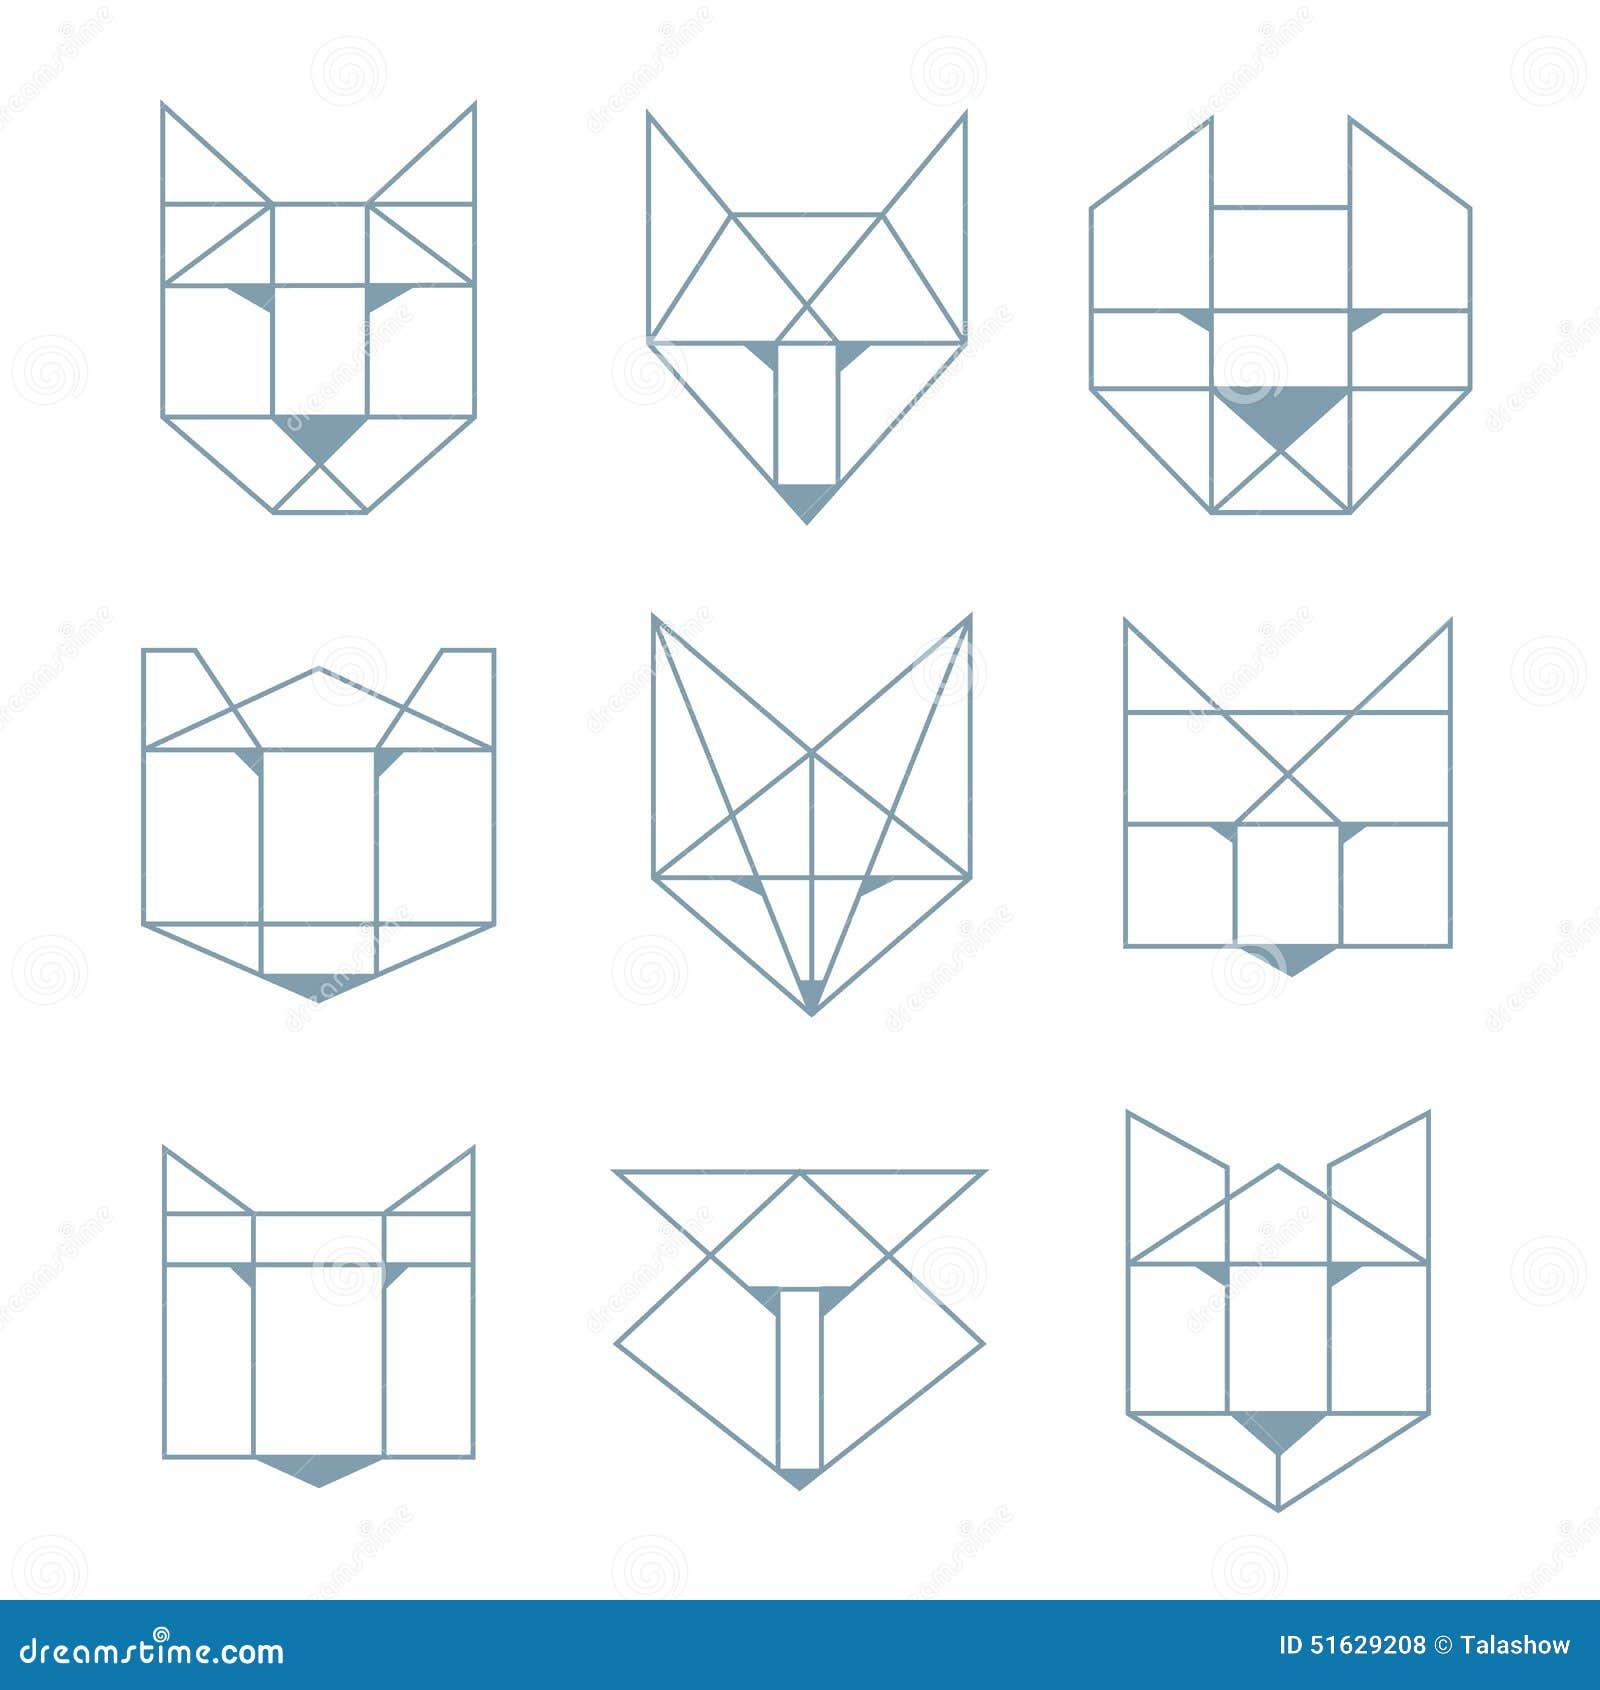 animaux g om triques illustration de vecteur image 51629208. Black Bedroom Furniture Sets. Home Design Ideas